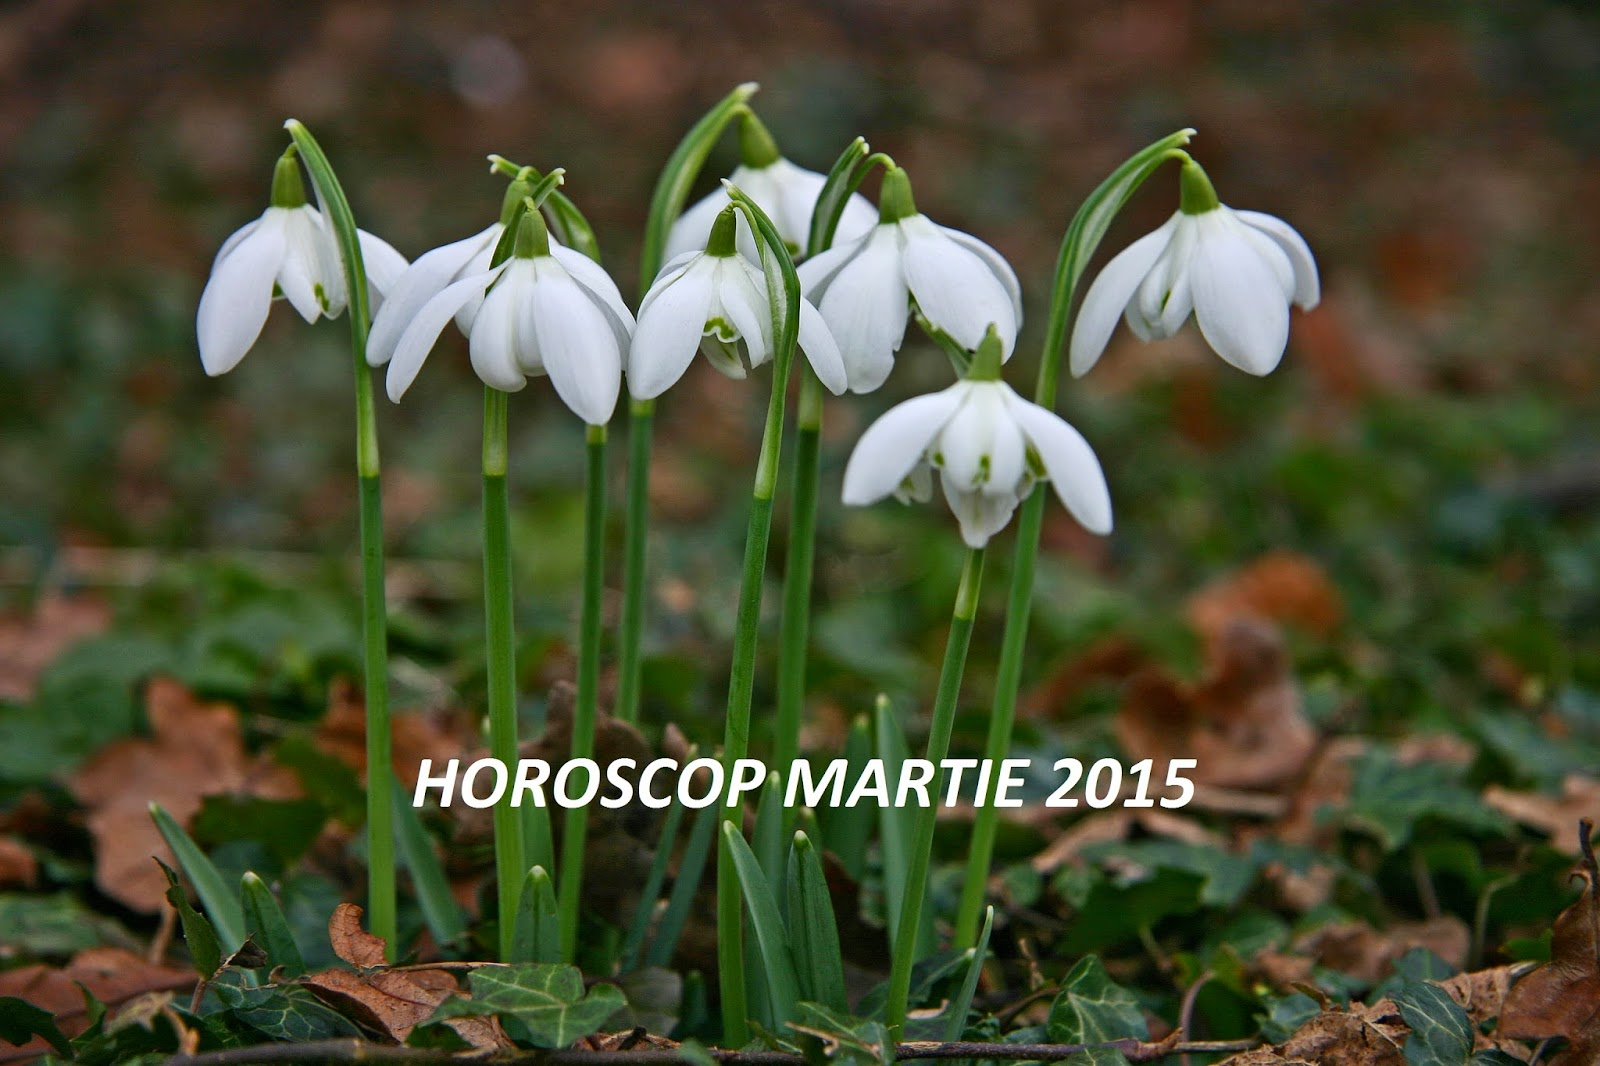 Horoscop martie 2015 - Toate zodiile